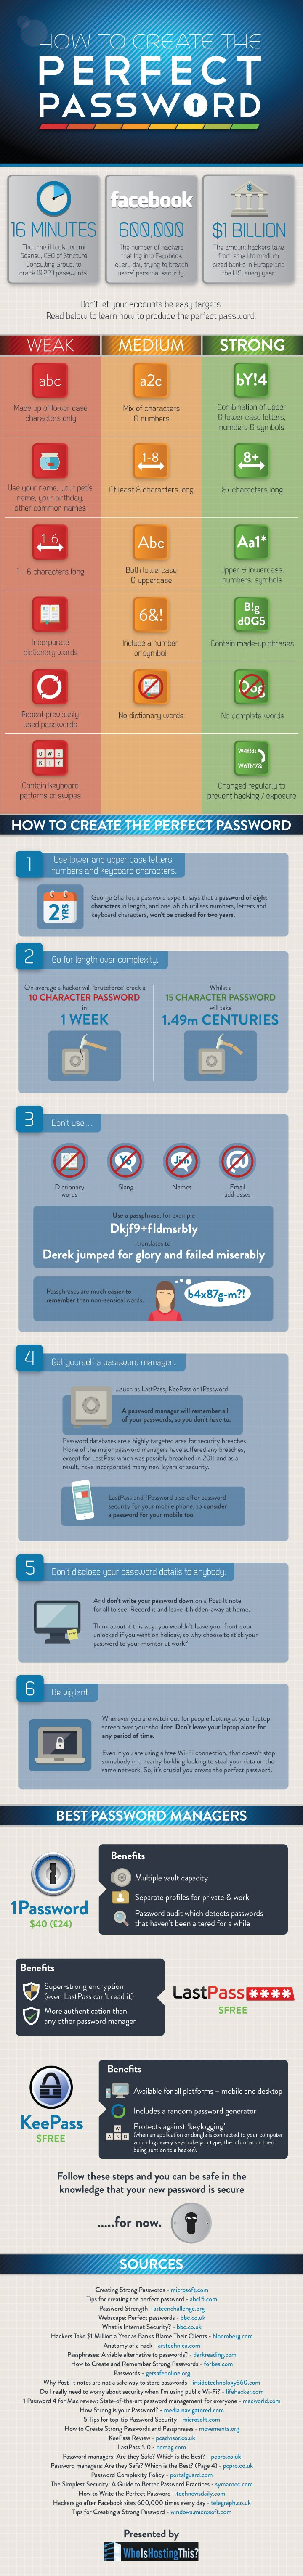 Cómo crear contraseñas perfectas Vía: WhoisHostingThis #infografia #infographic #internet